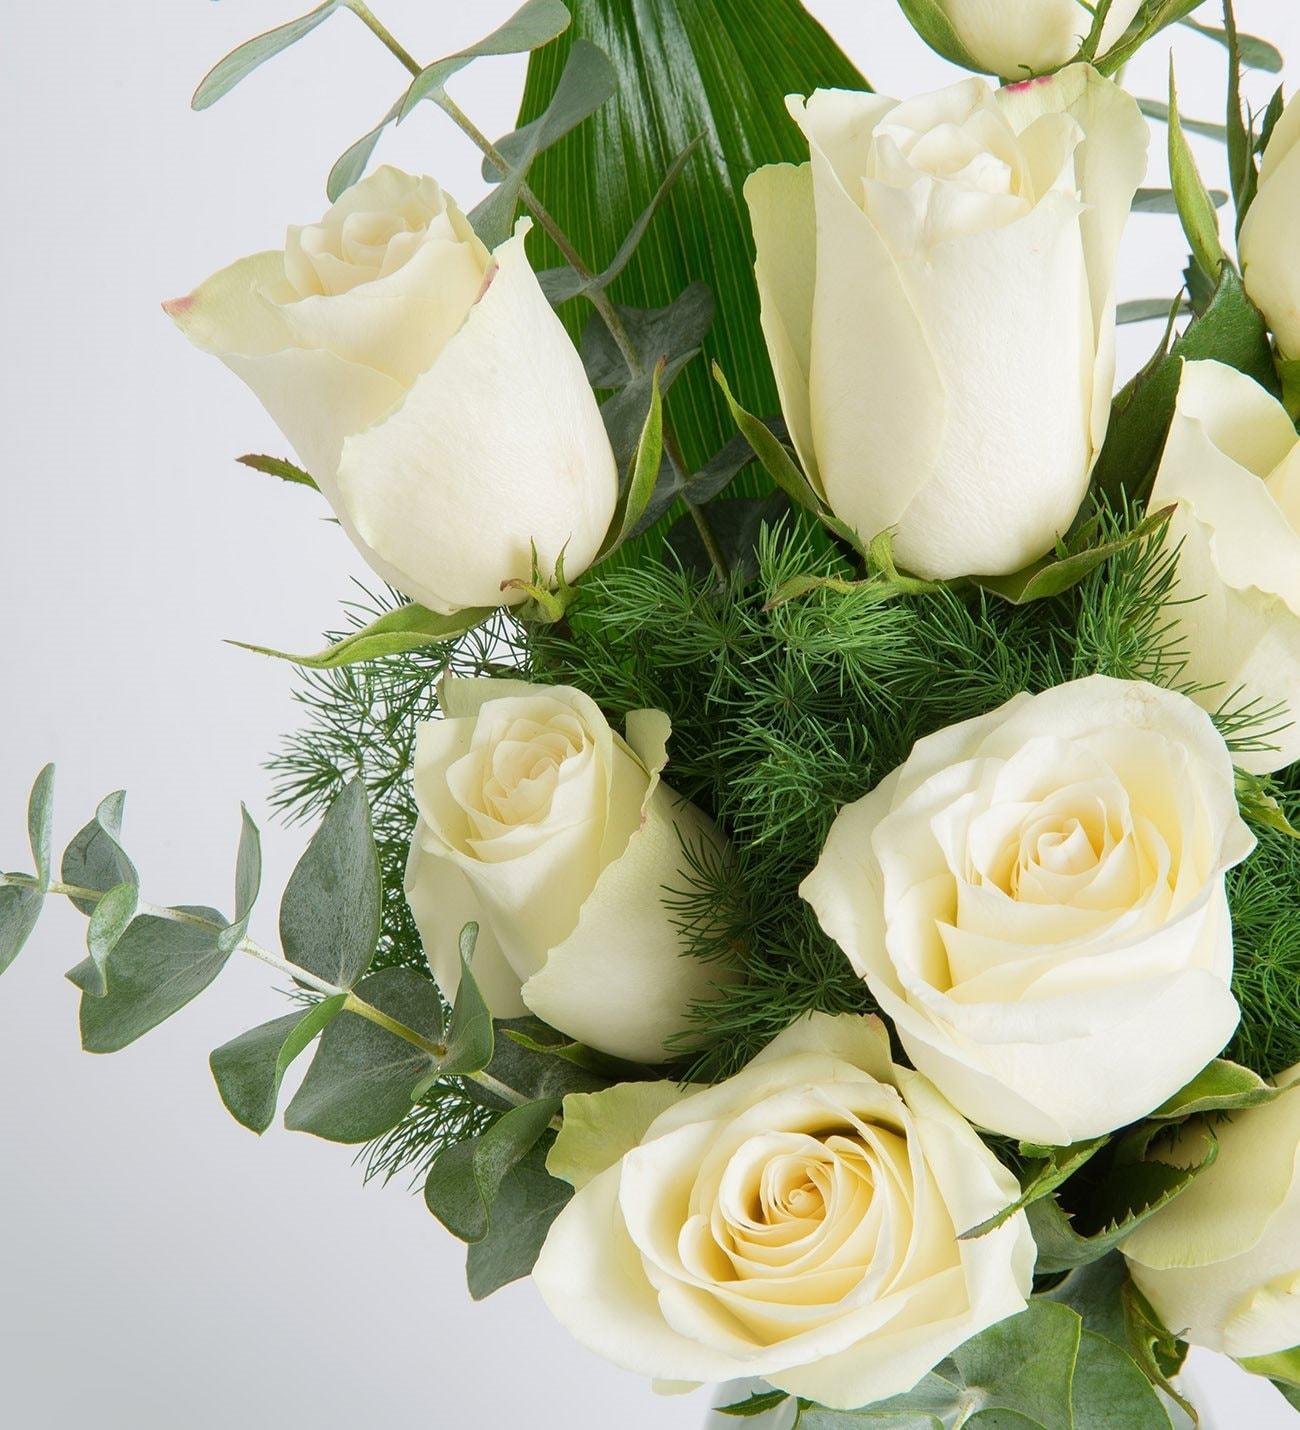 11 Rosas Blancas En Follaje Verde Sobre Florero De Cristal